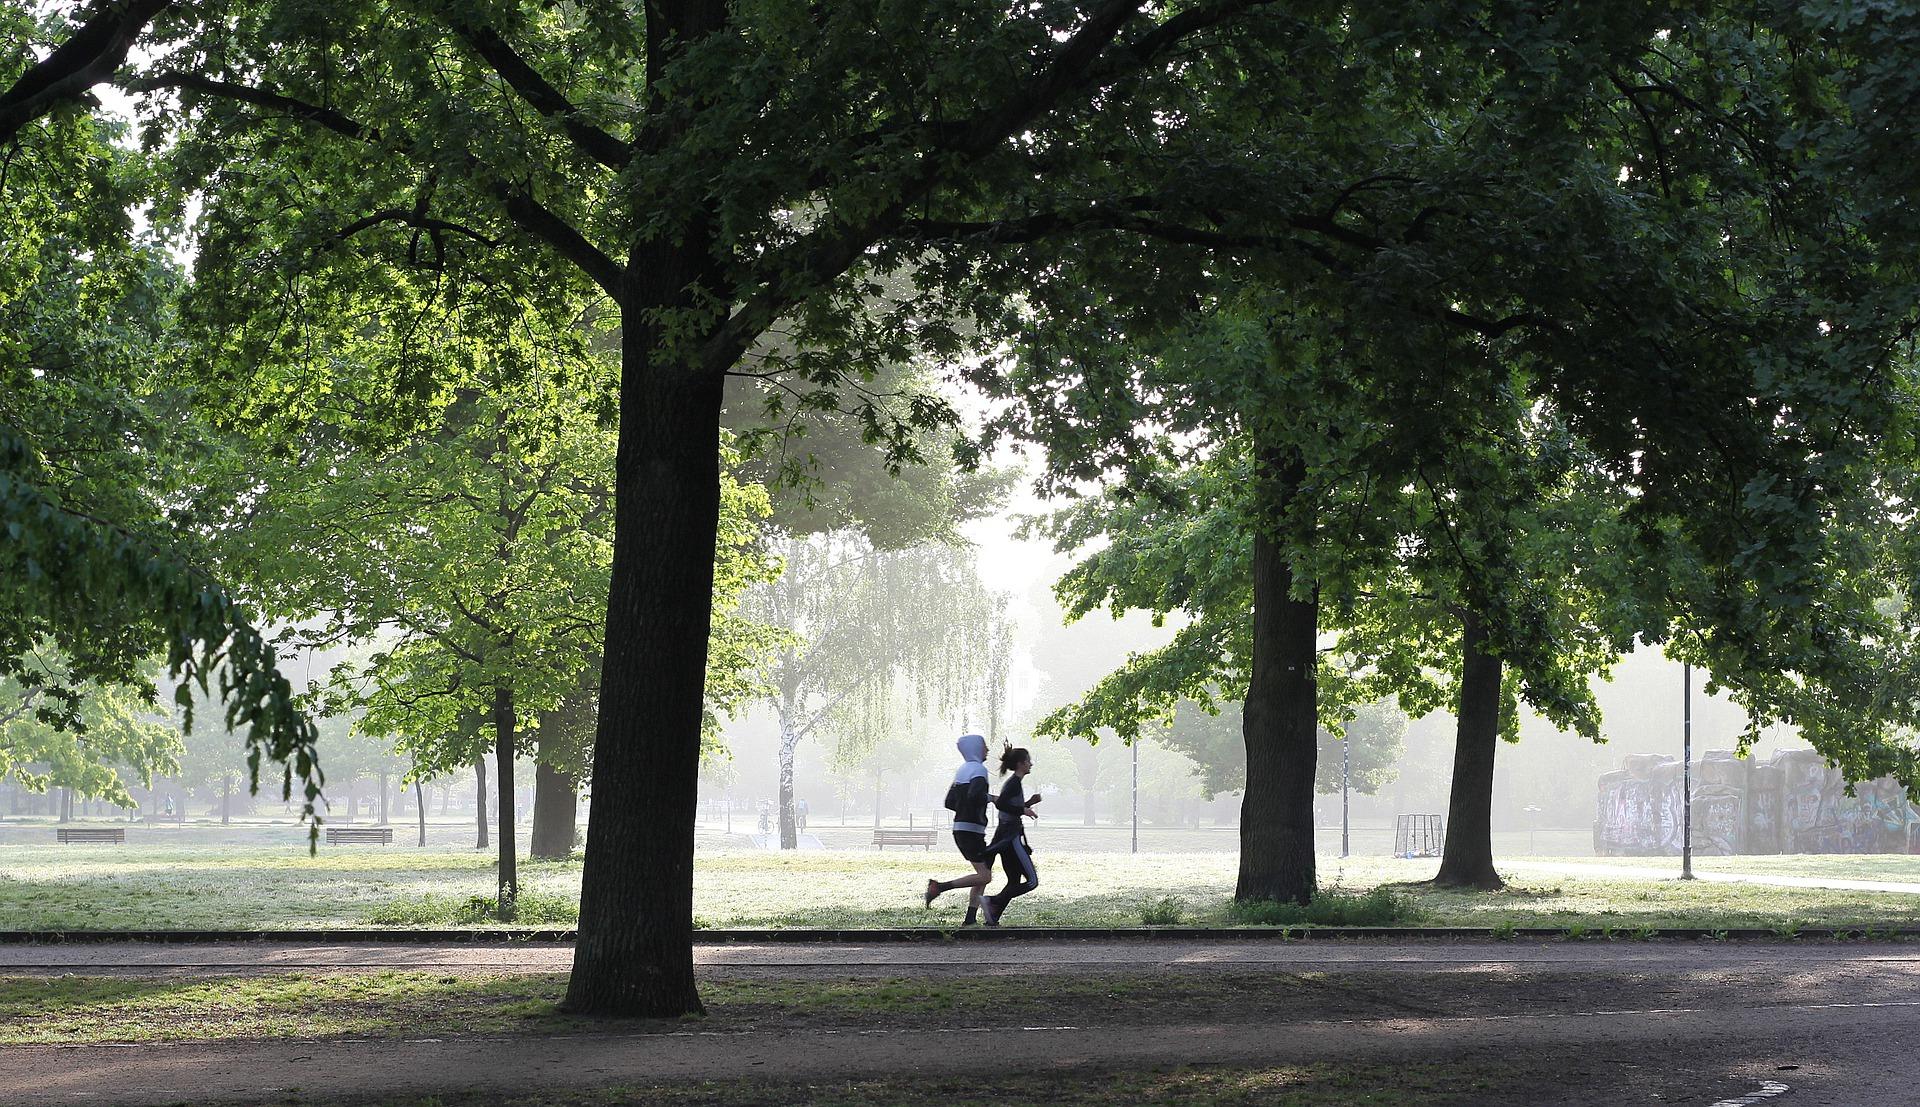 Saiba os benefícios da corrida para a saúde